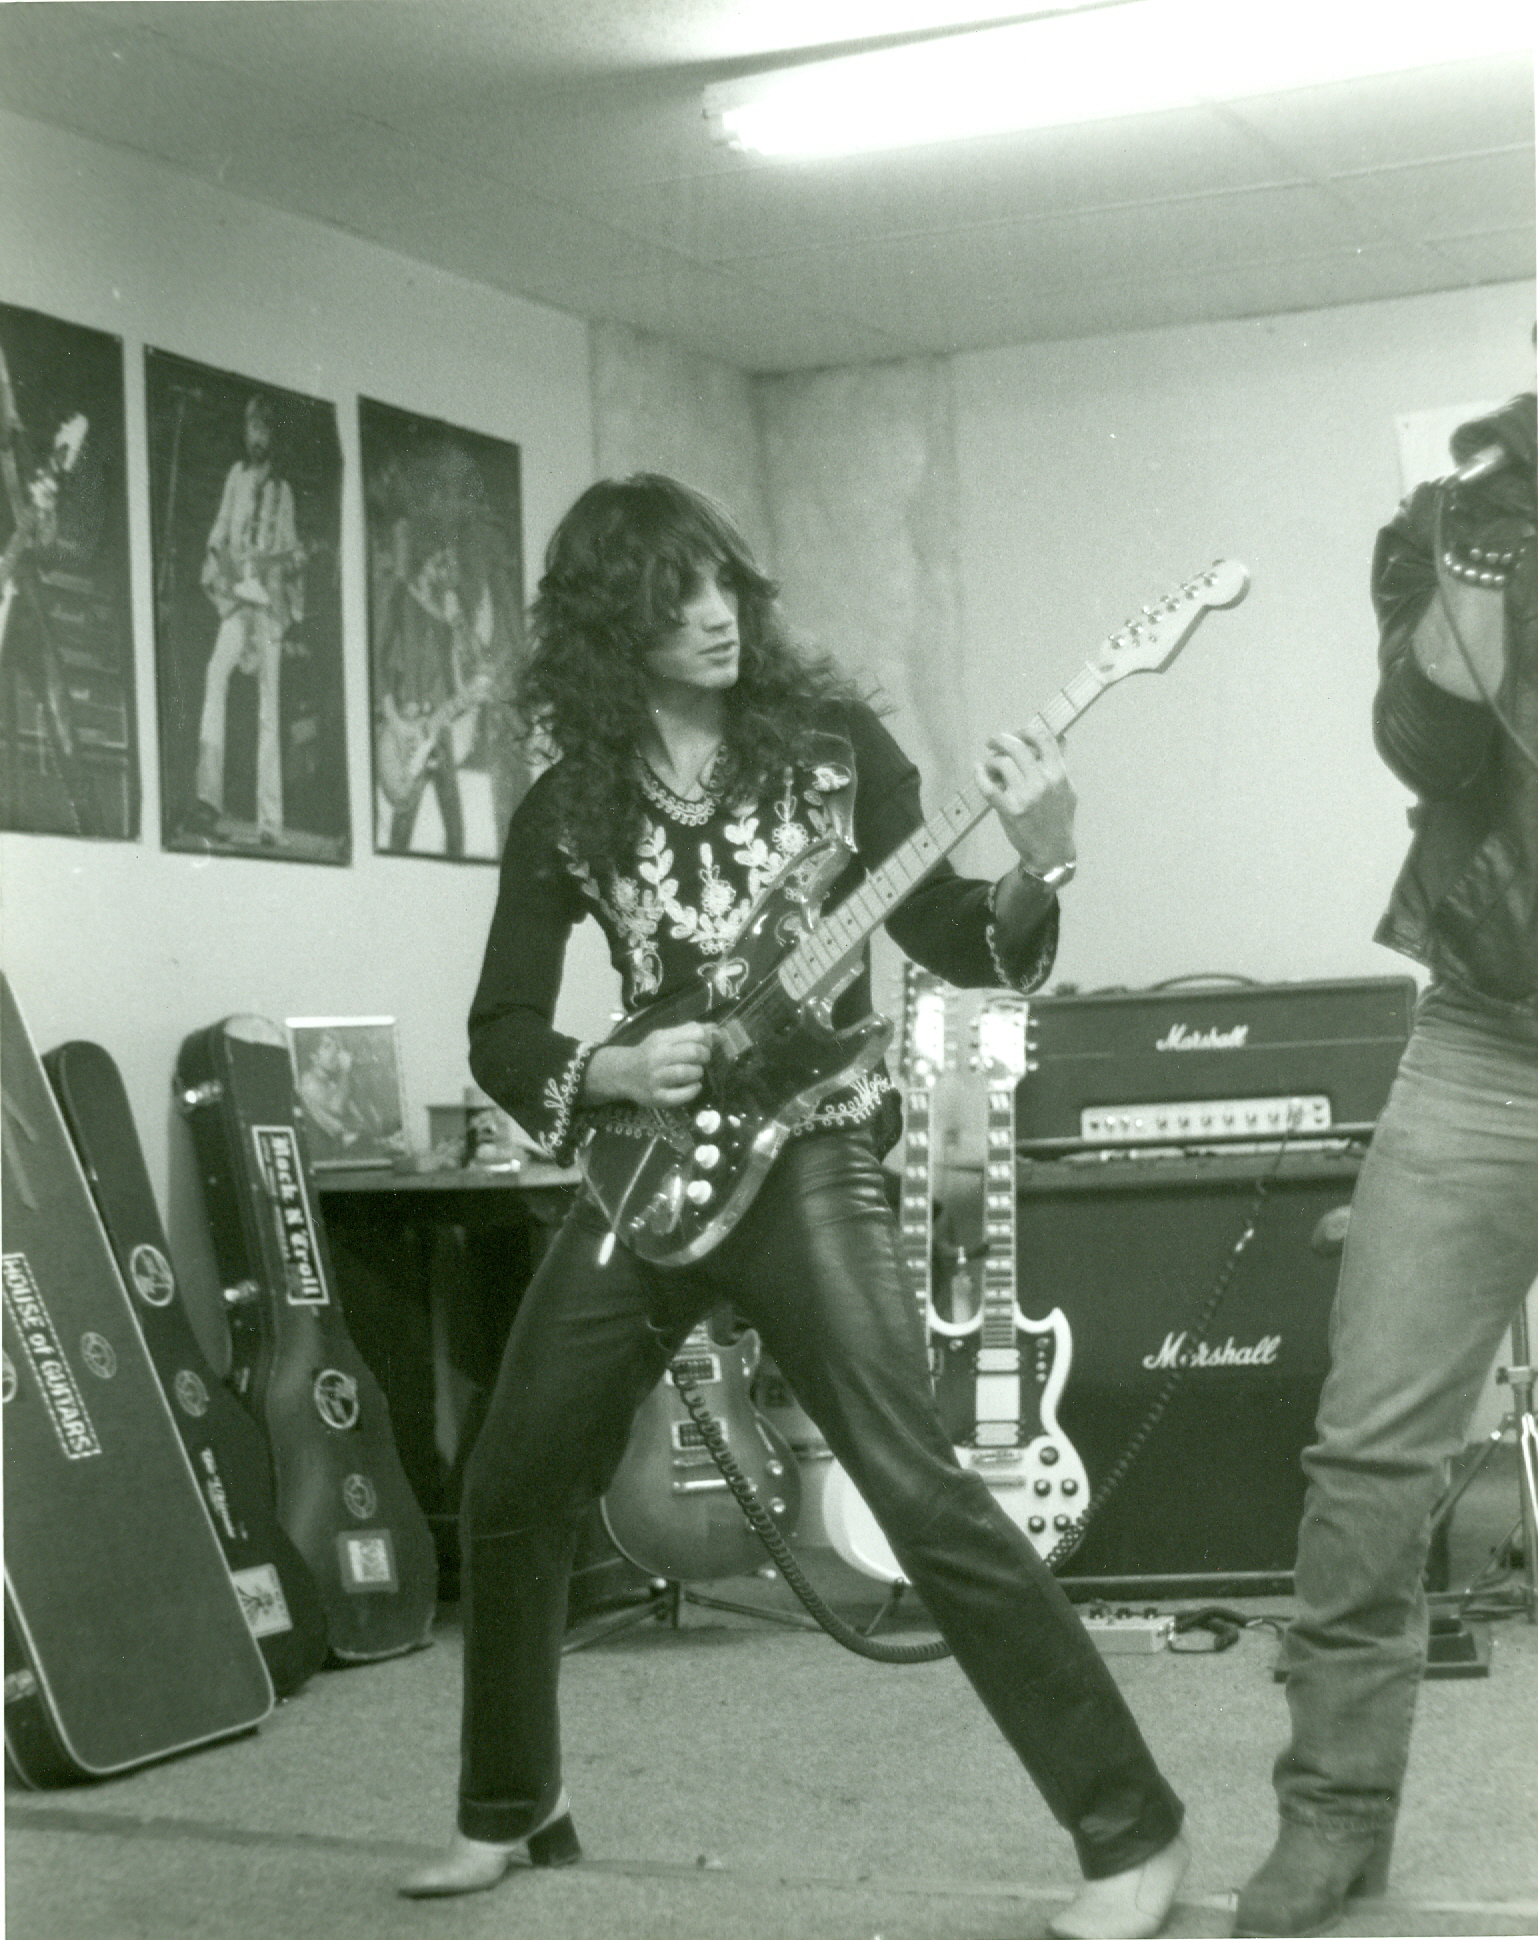 1981 Steel Assassin